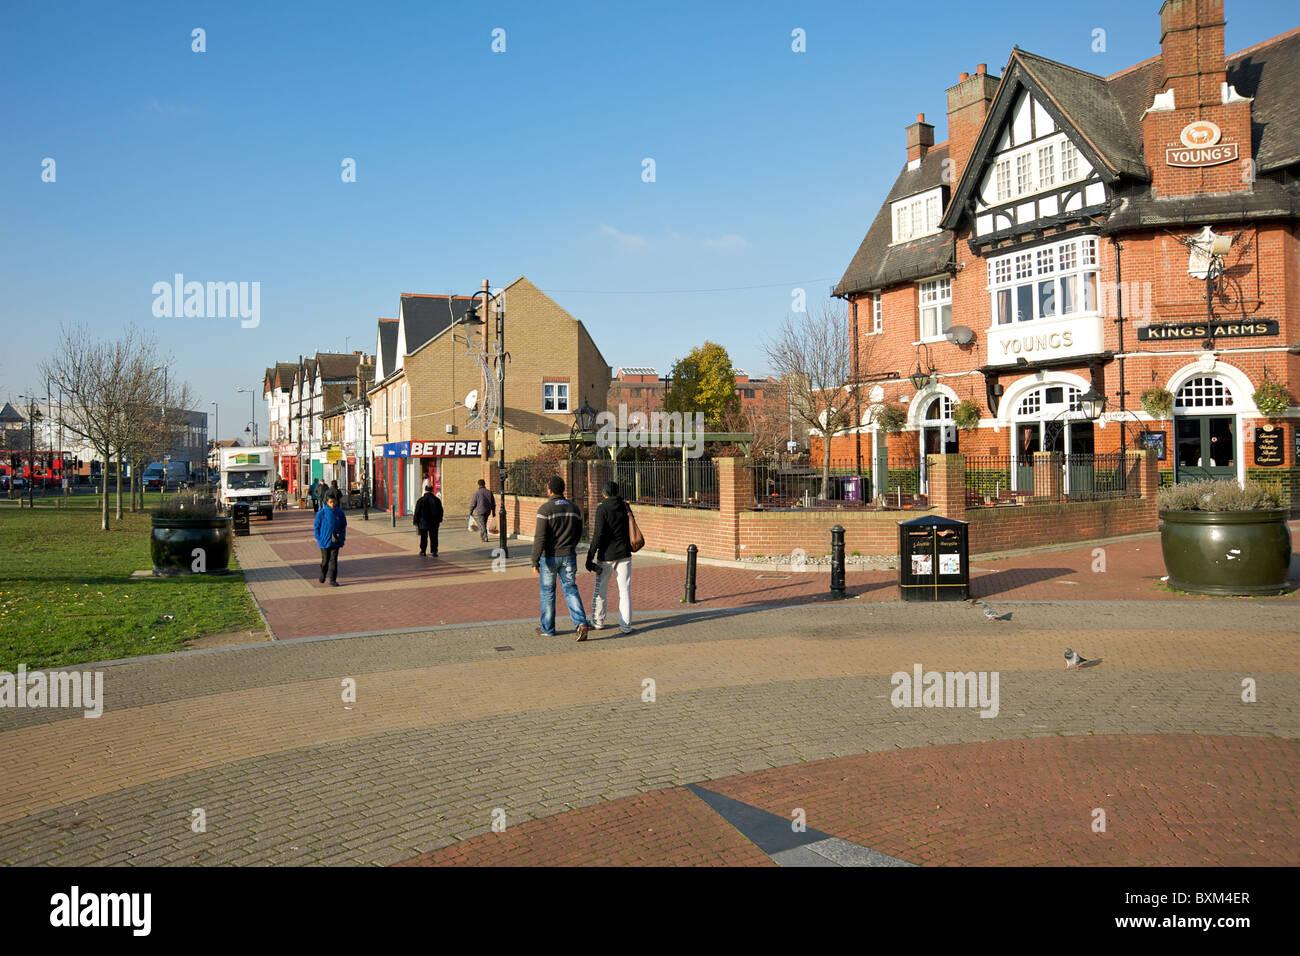 Mitcham to Surrey - 7 ways to travel via train, plane, and ...